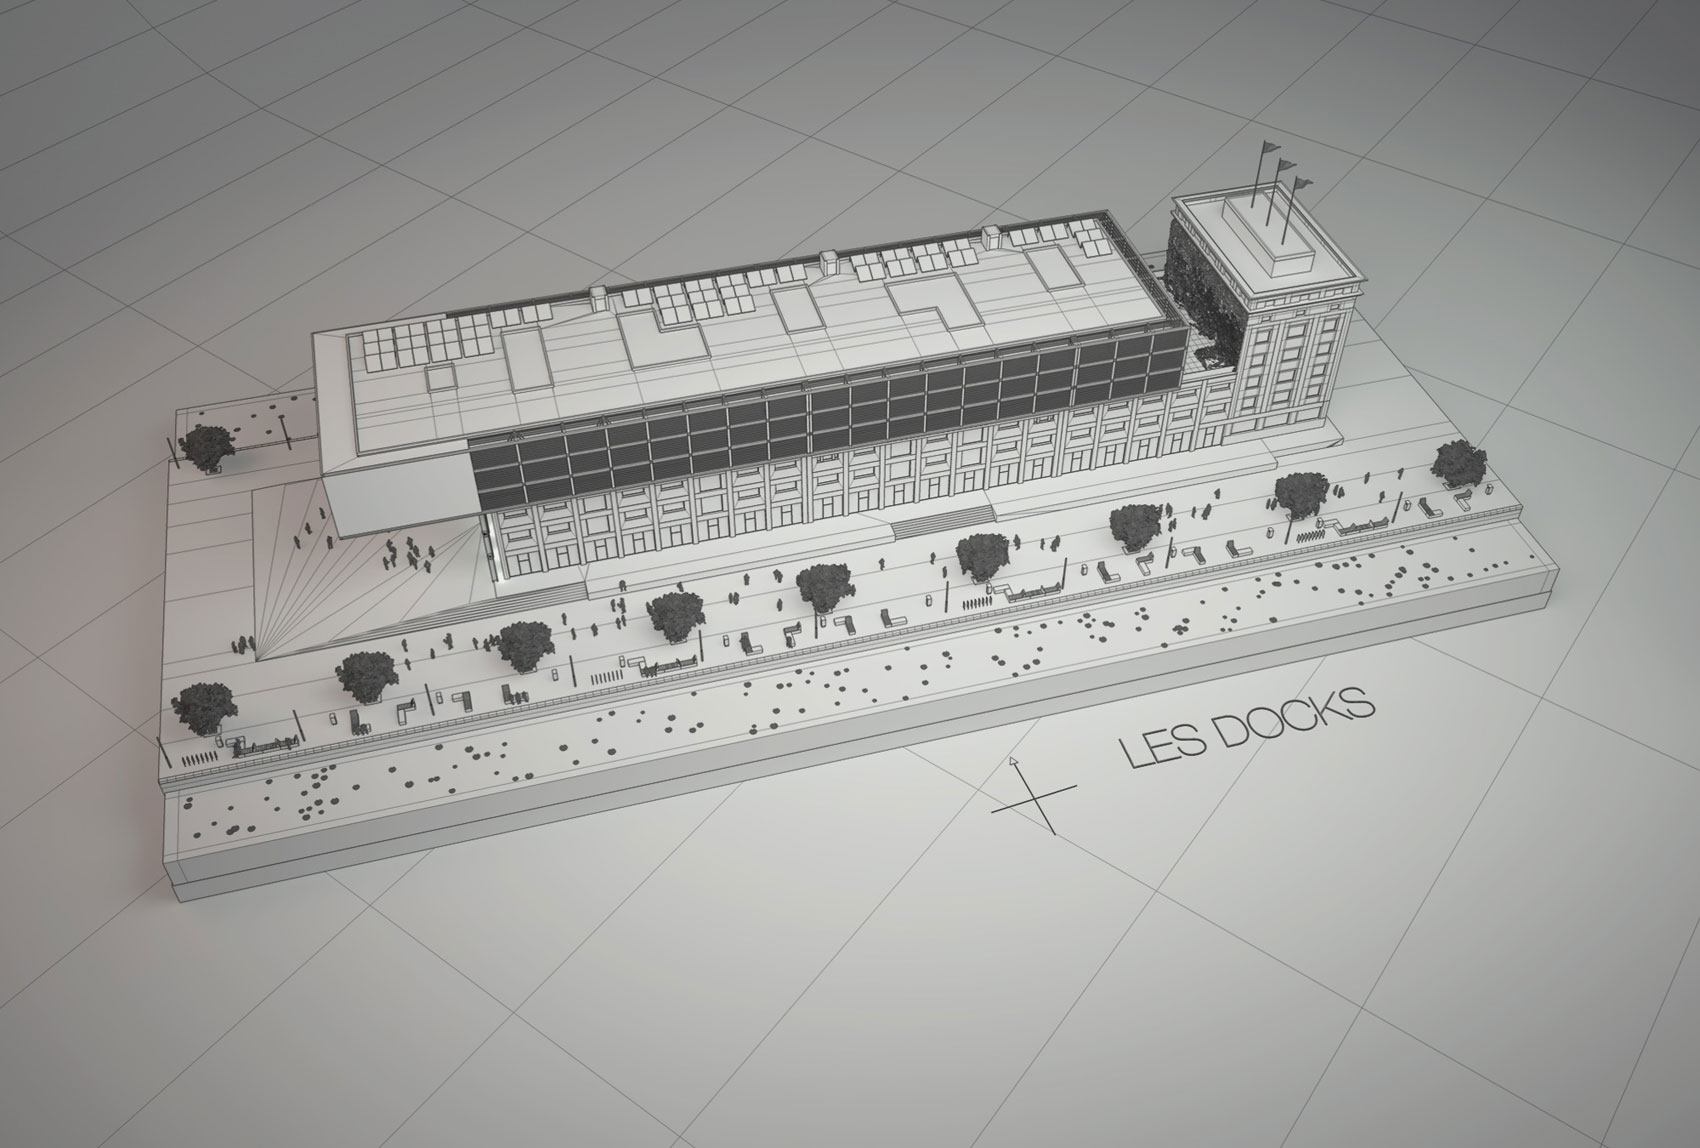 les-docks-1